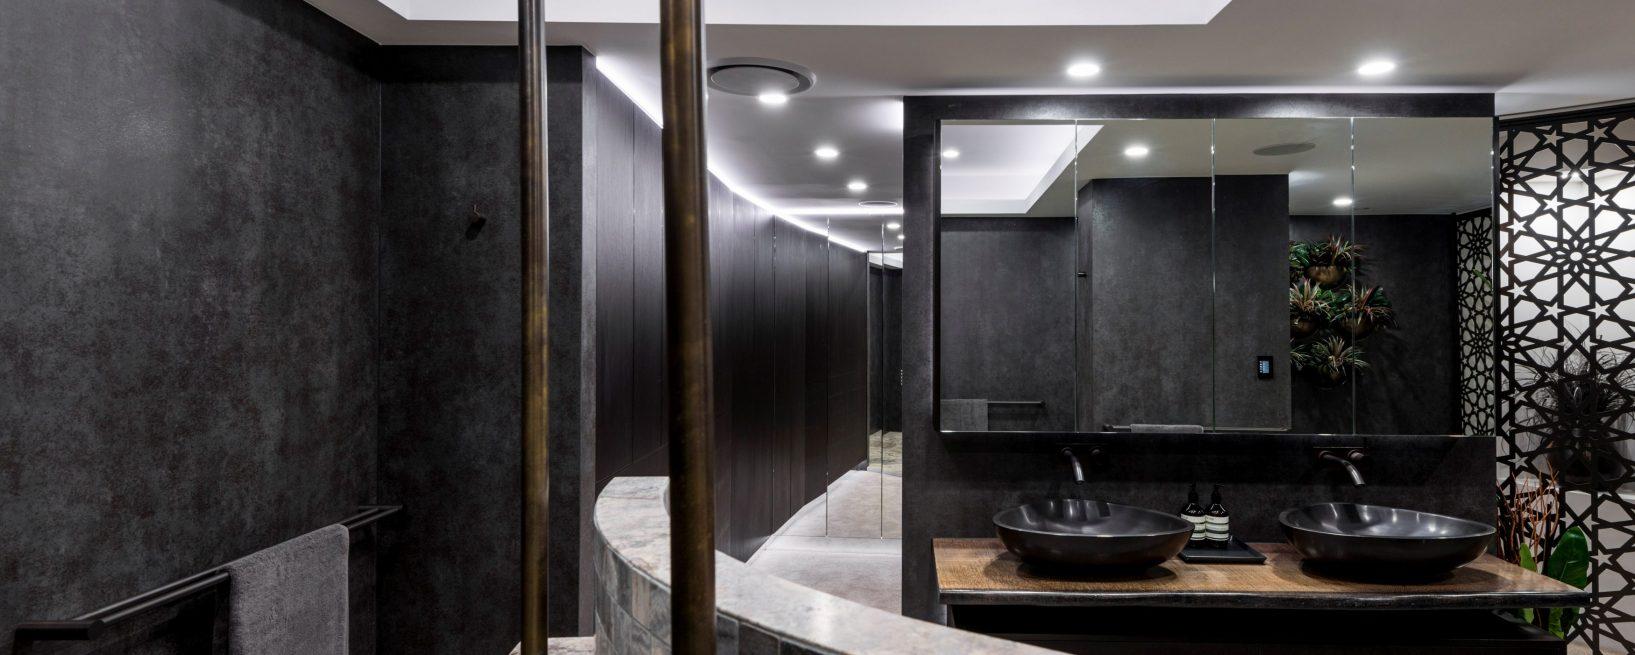 Brisbane CBD Penthouse - Master Suite Bathroom Renovation